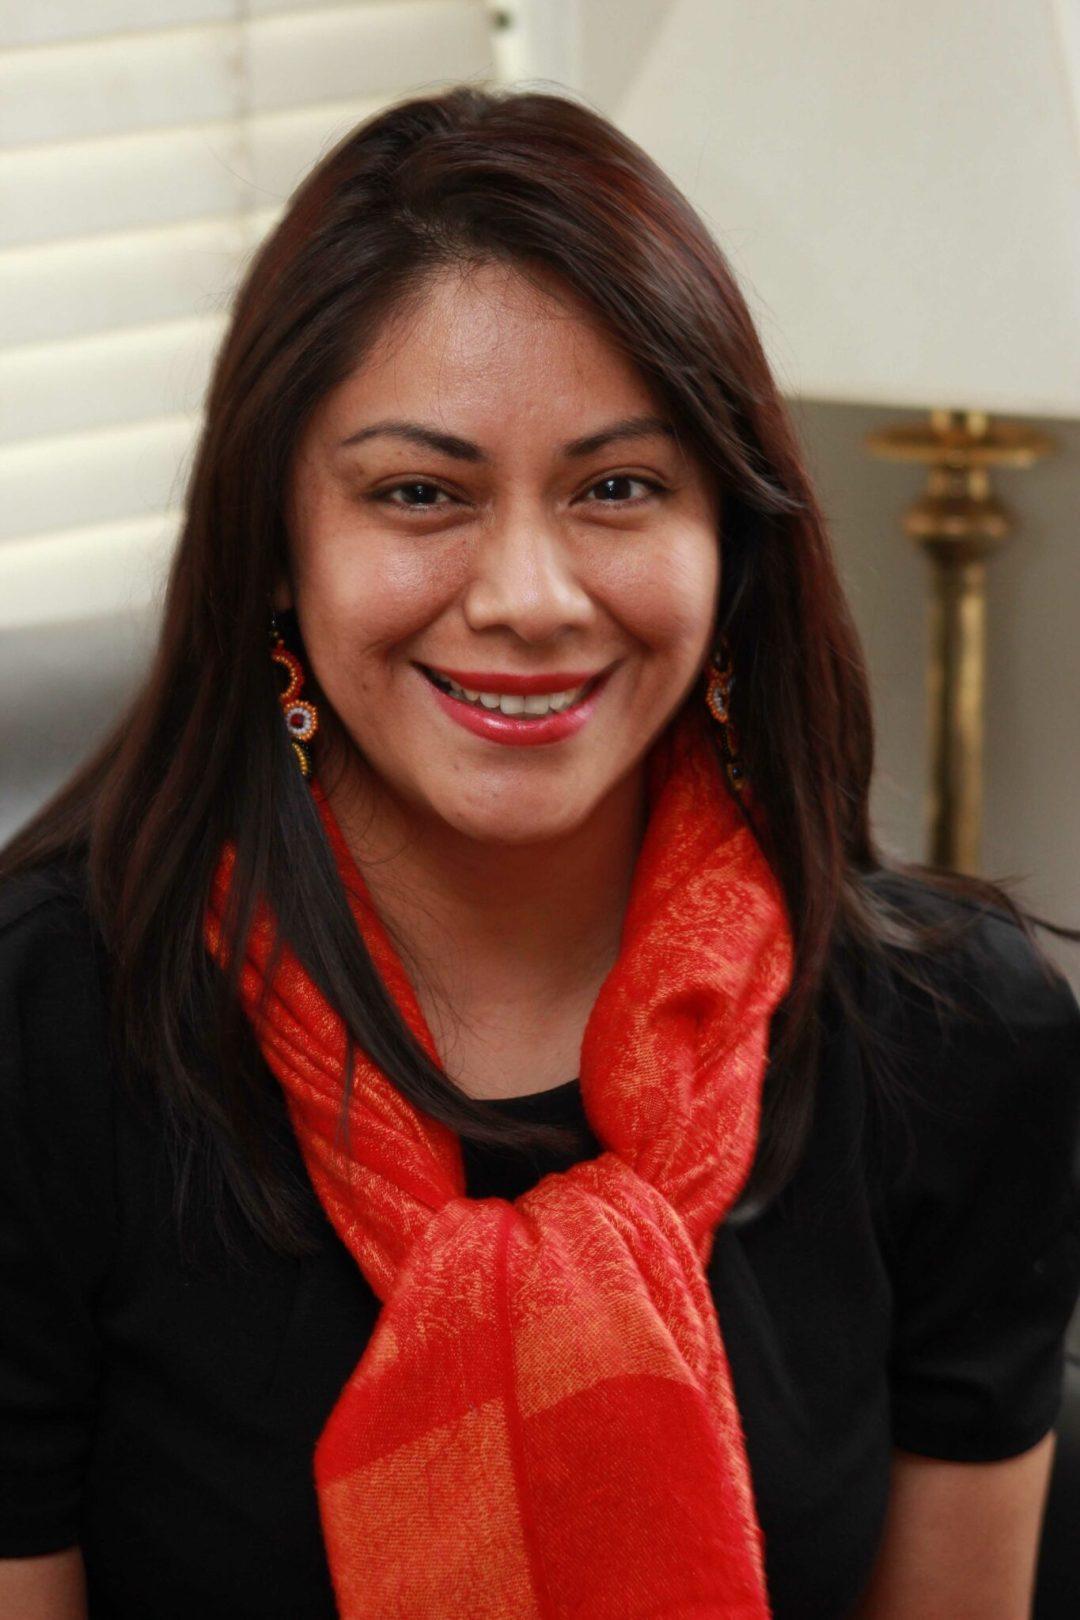 Marlene Rojas